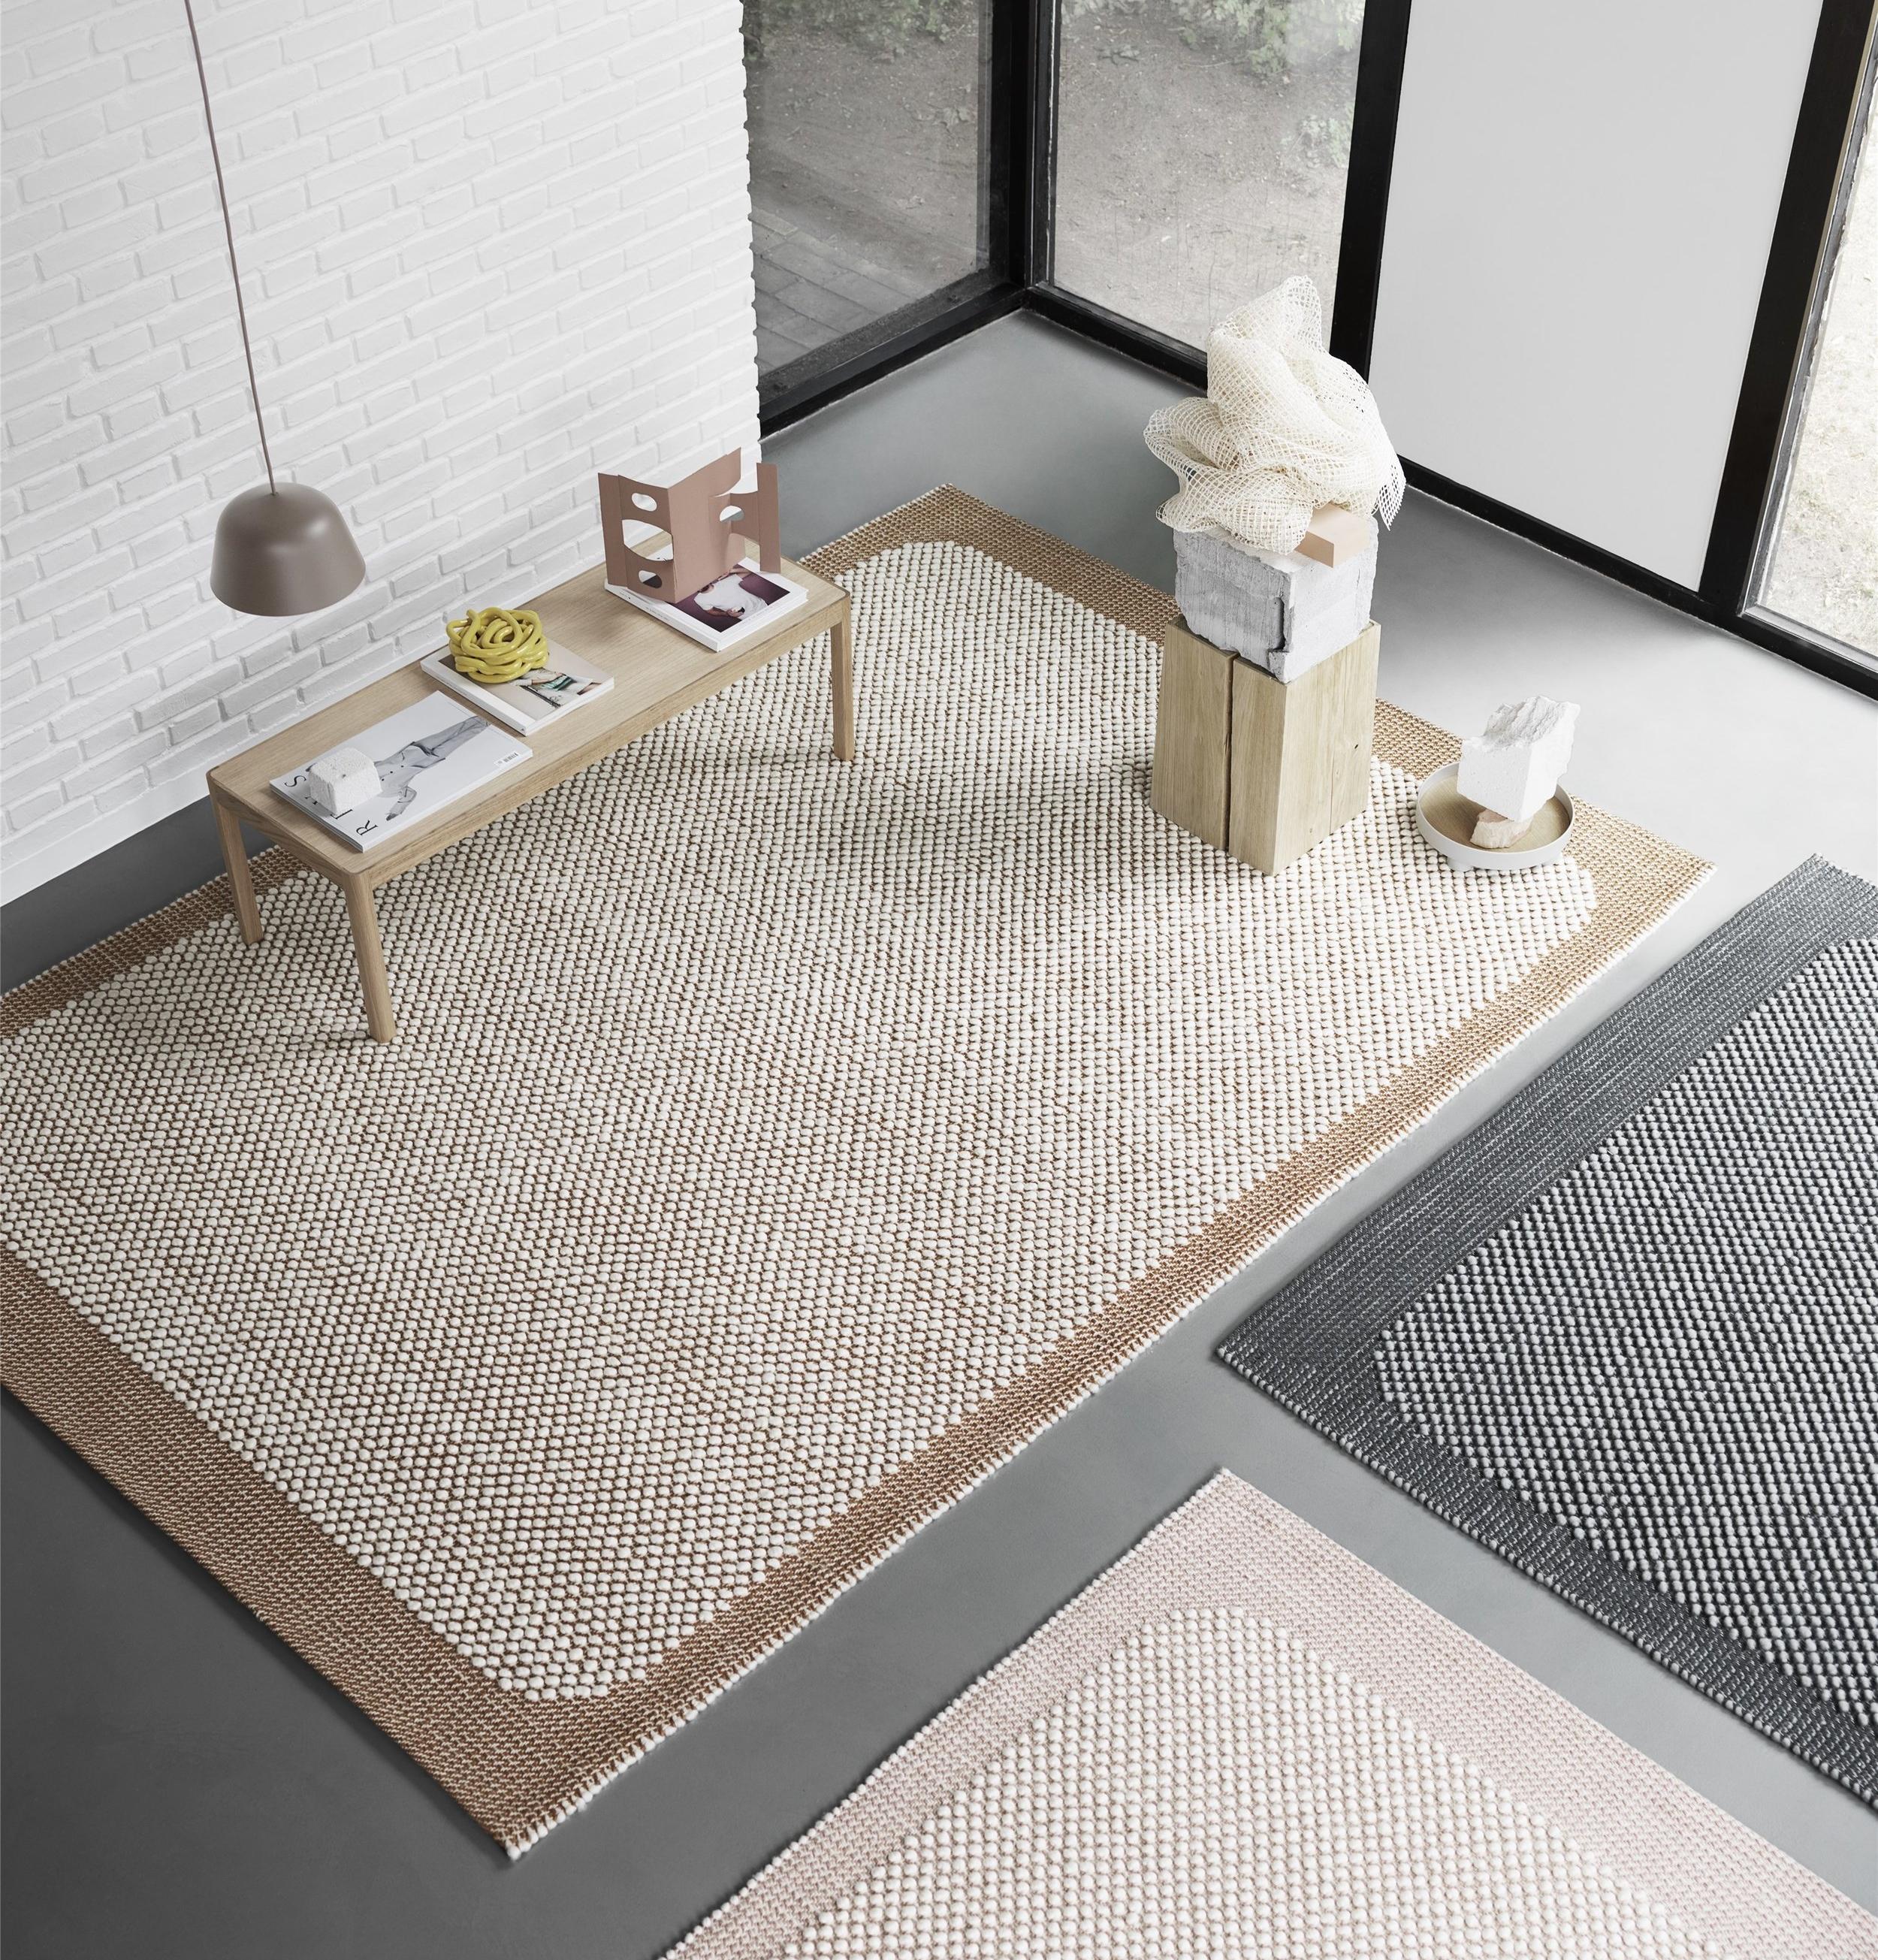 Pebble rug, muuto, home decor, accessories, interiors, scandinavian design 1.jpg